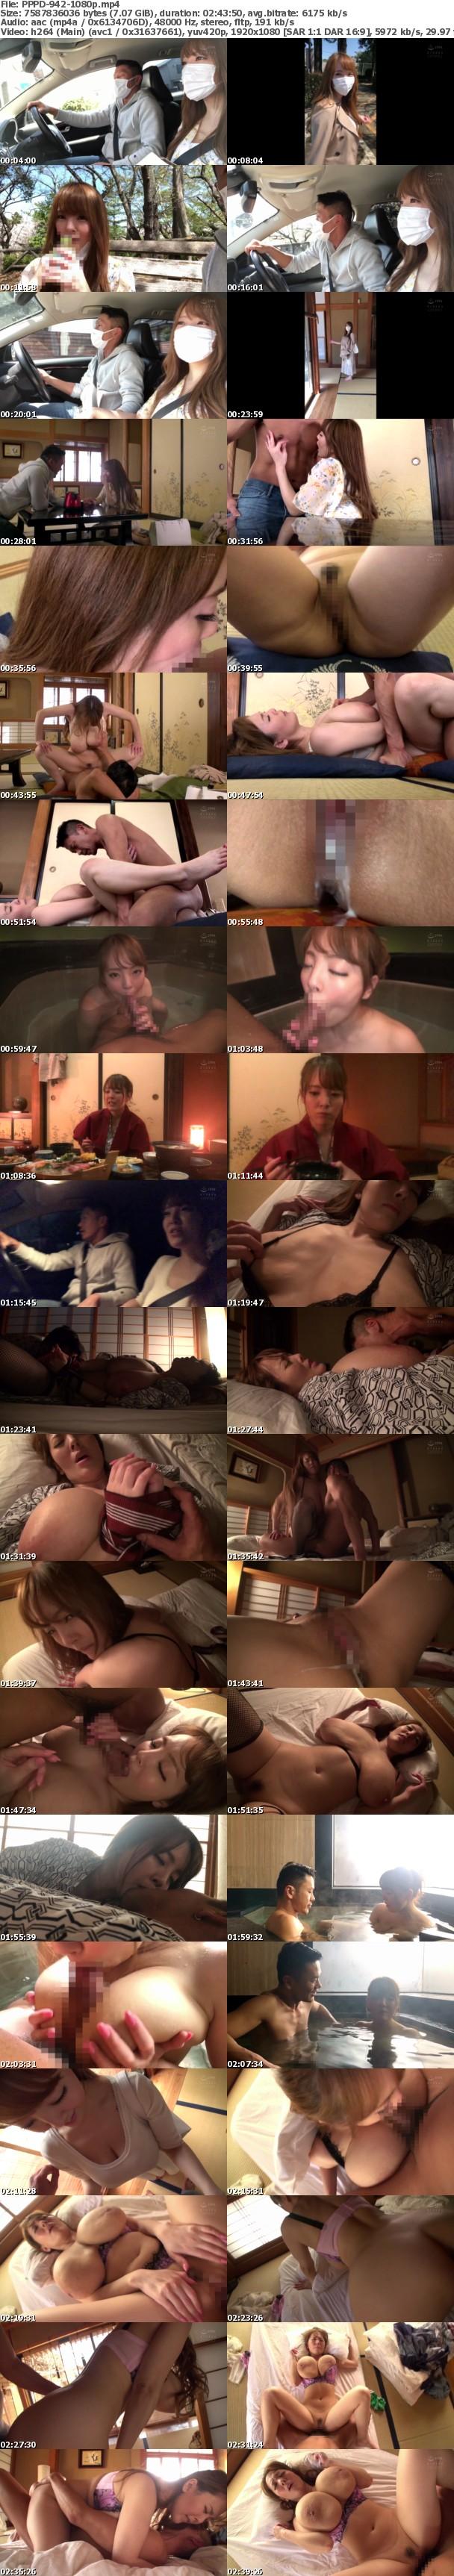 (Full HD) PPPD-942 在宅明けで演技台本一切無し!世界一女優Hitomiが欲望剥き出しで貪り合いSEX Hitomi